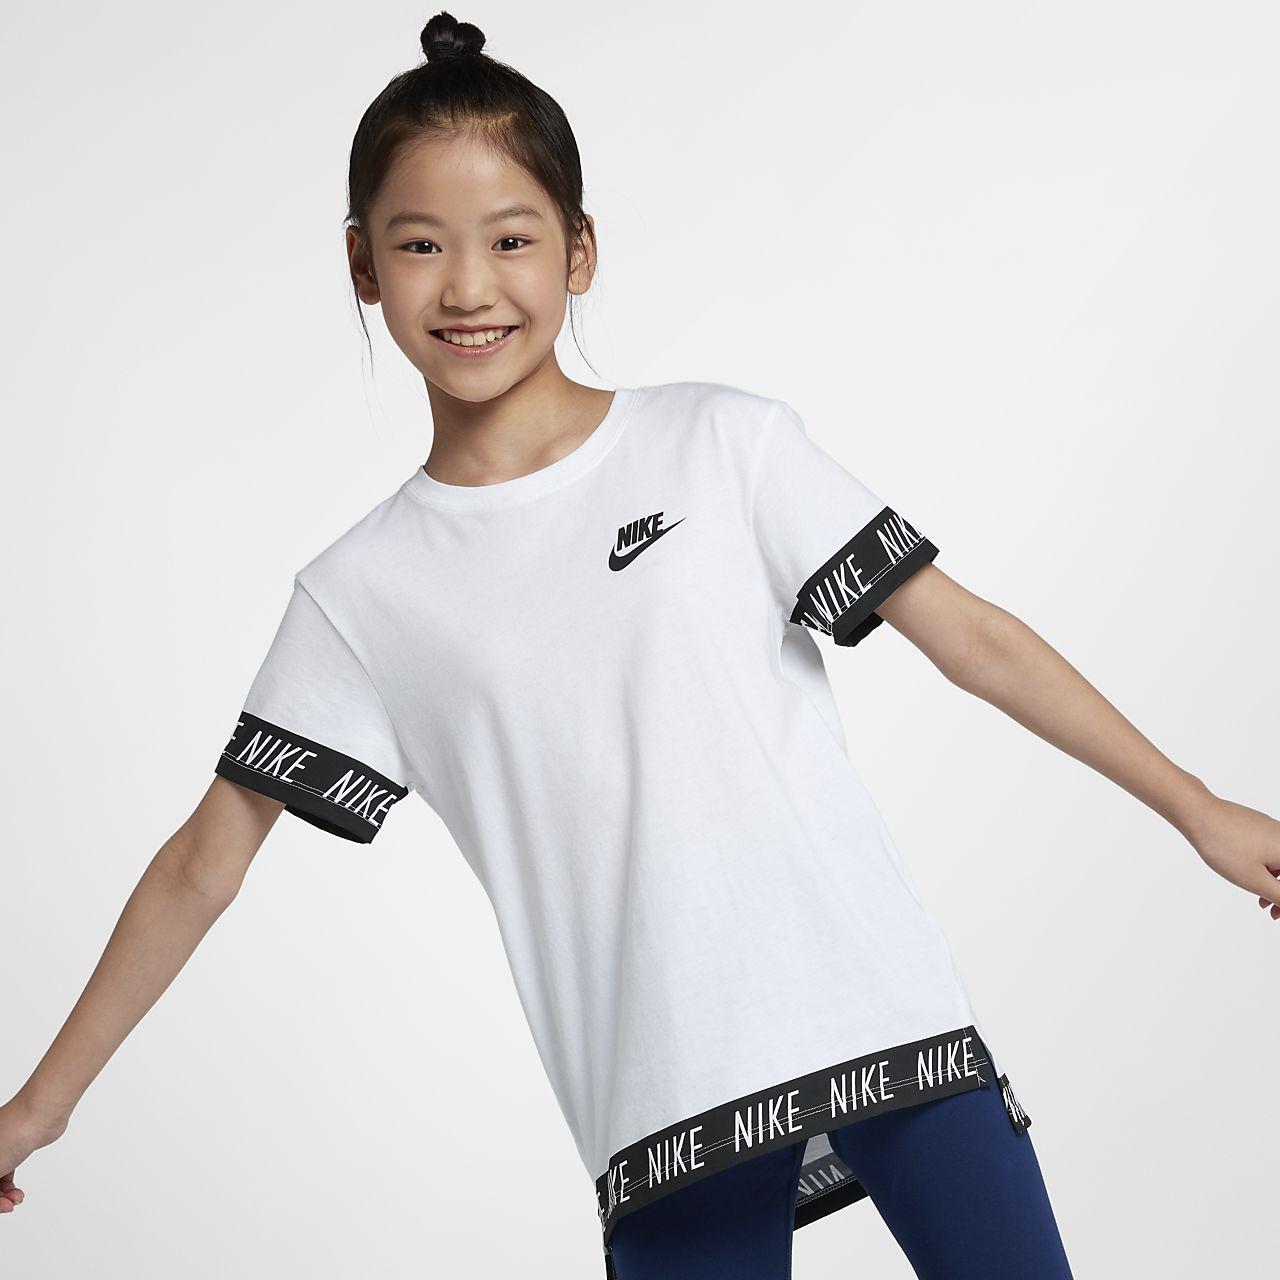 Ch Pour Tee Nike Âgée Shirt Sportswear Fille Plus qvFOT0wP